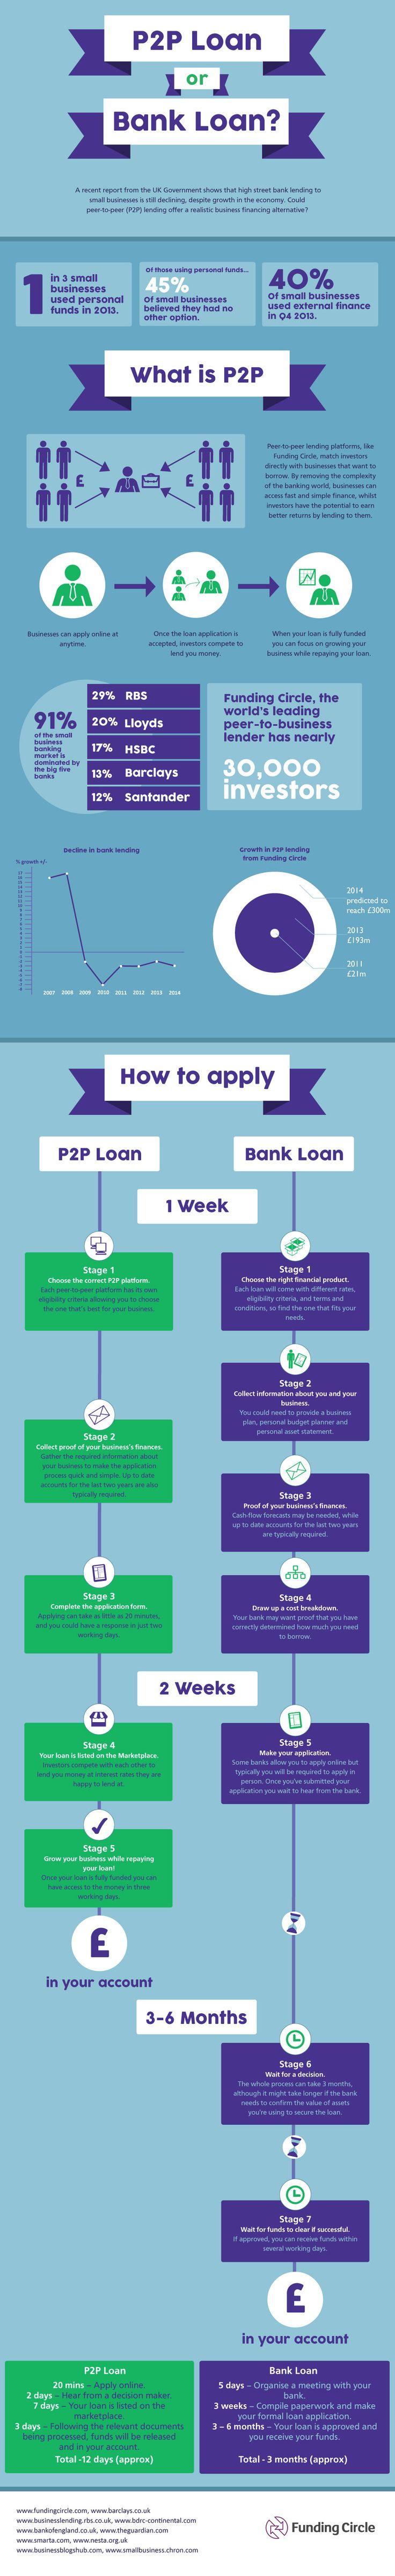 Small Business Funding Peer to Peer Lending or Bank http://thelendingmag.com/peer-to-peer-lending-sites/Lending?